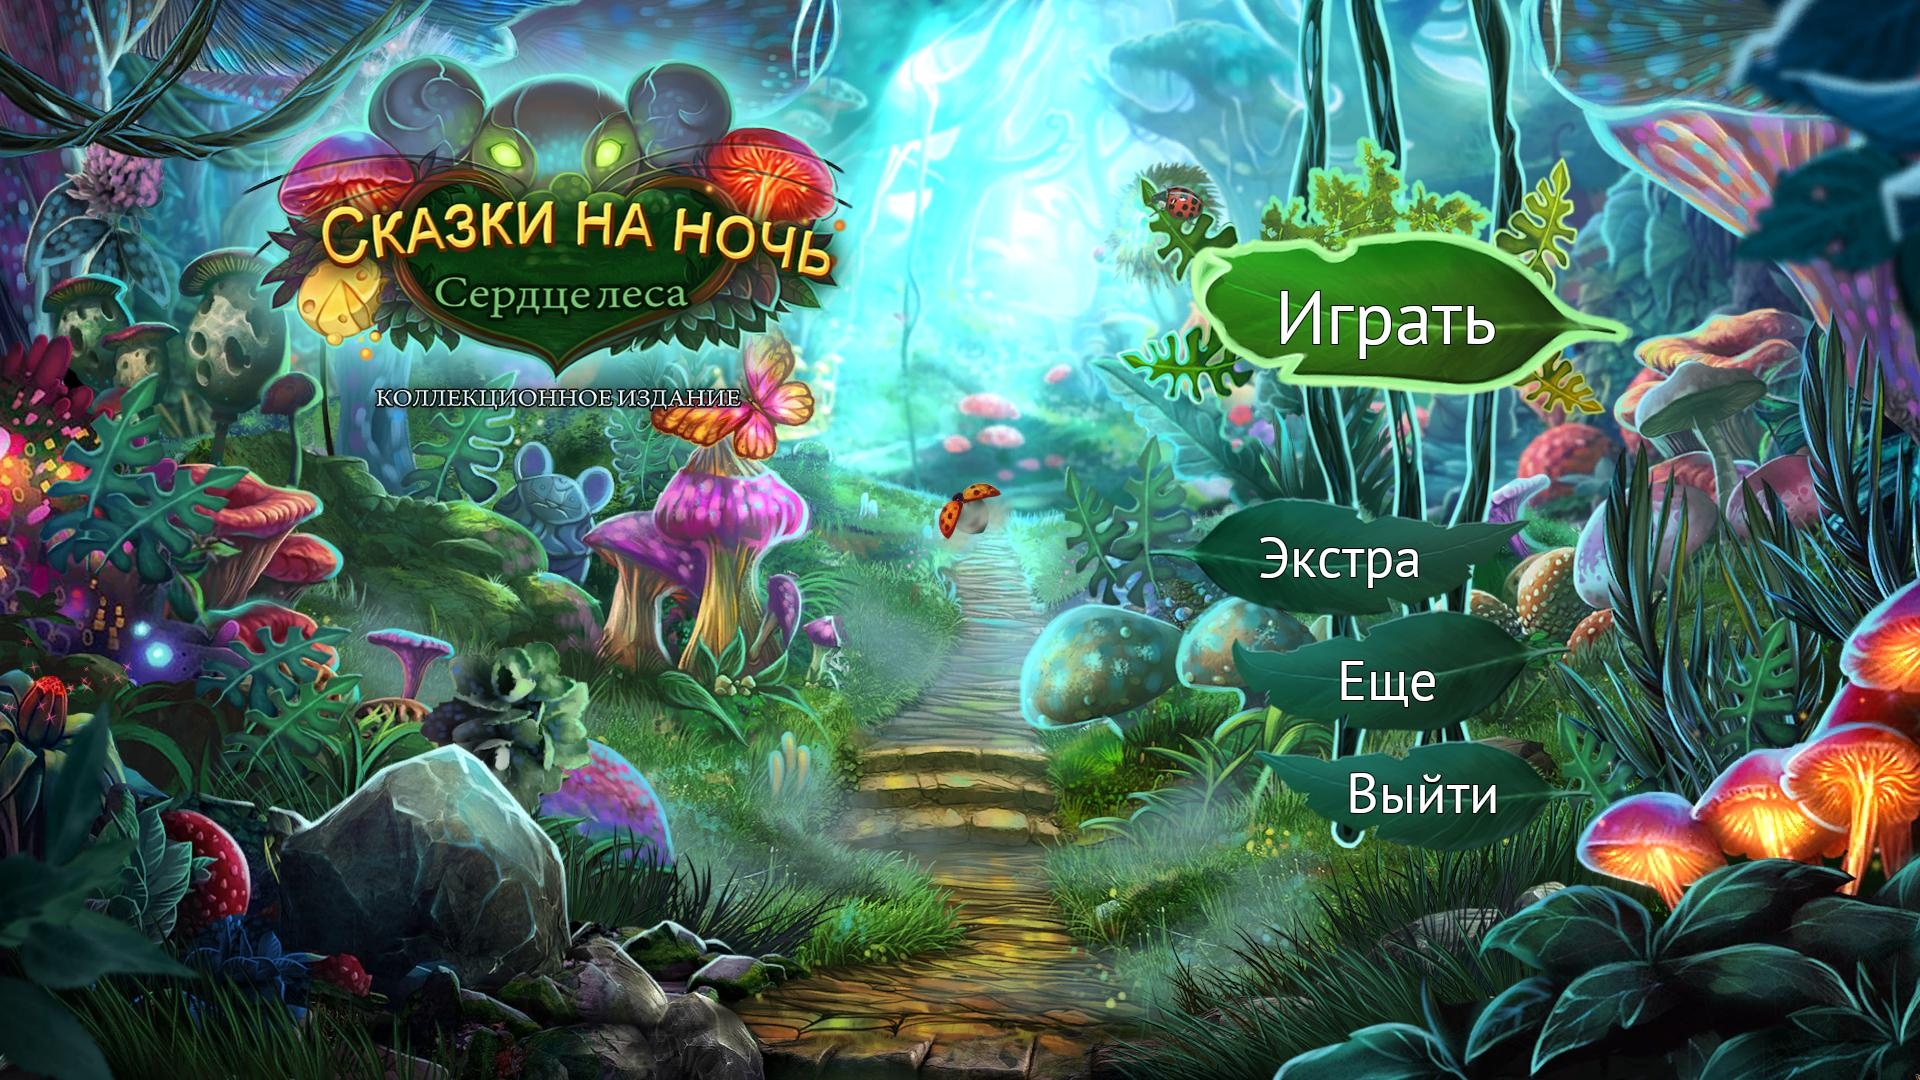 Сказки на ночь: Сердце леса. Коллекционное издание | Tiny Tales: Heart of the Forest CE (Rus)